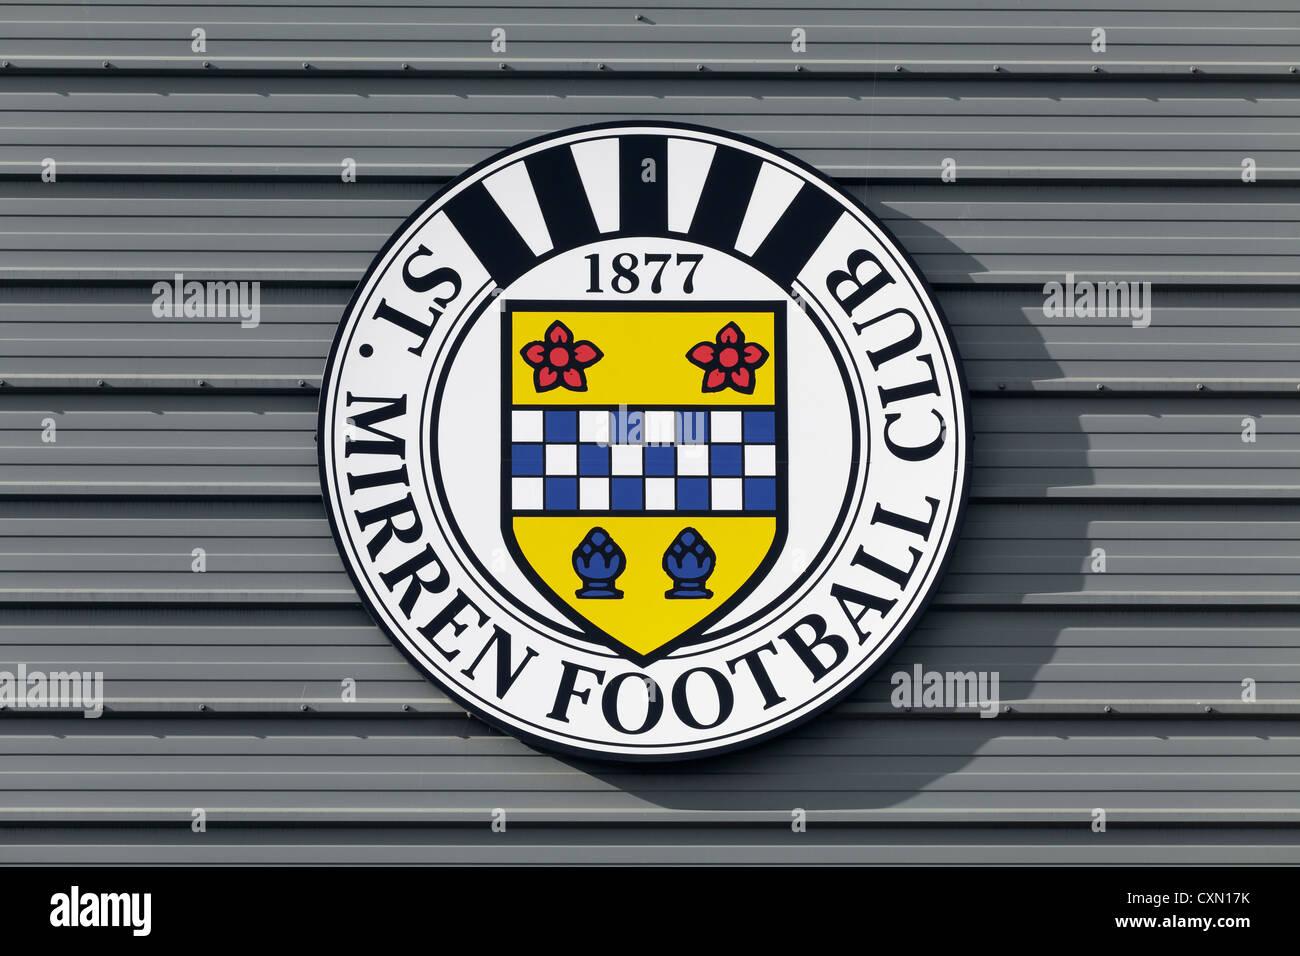 The Saint Mirren Football Club logo, Scotland, UK - Stock Image